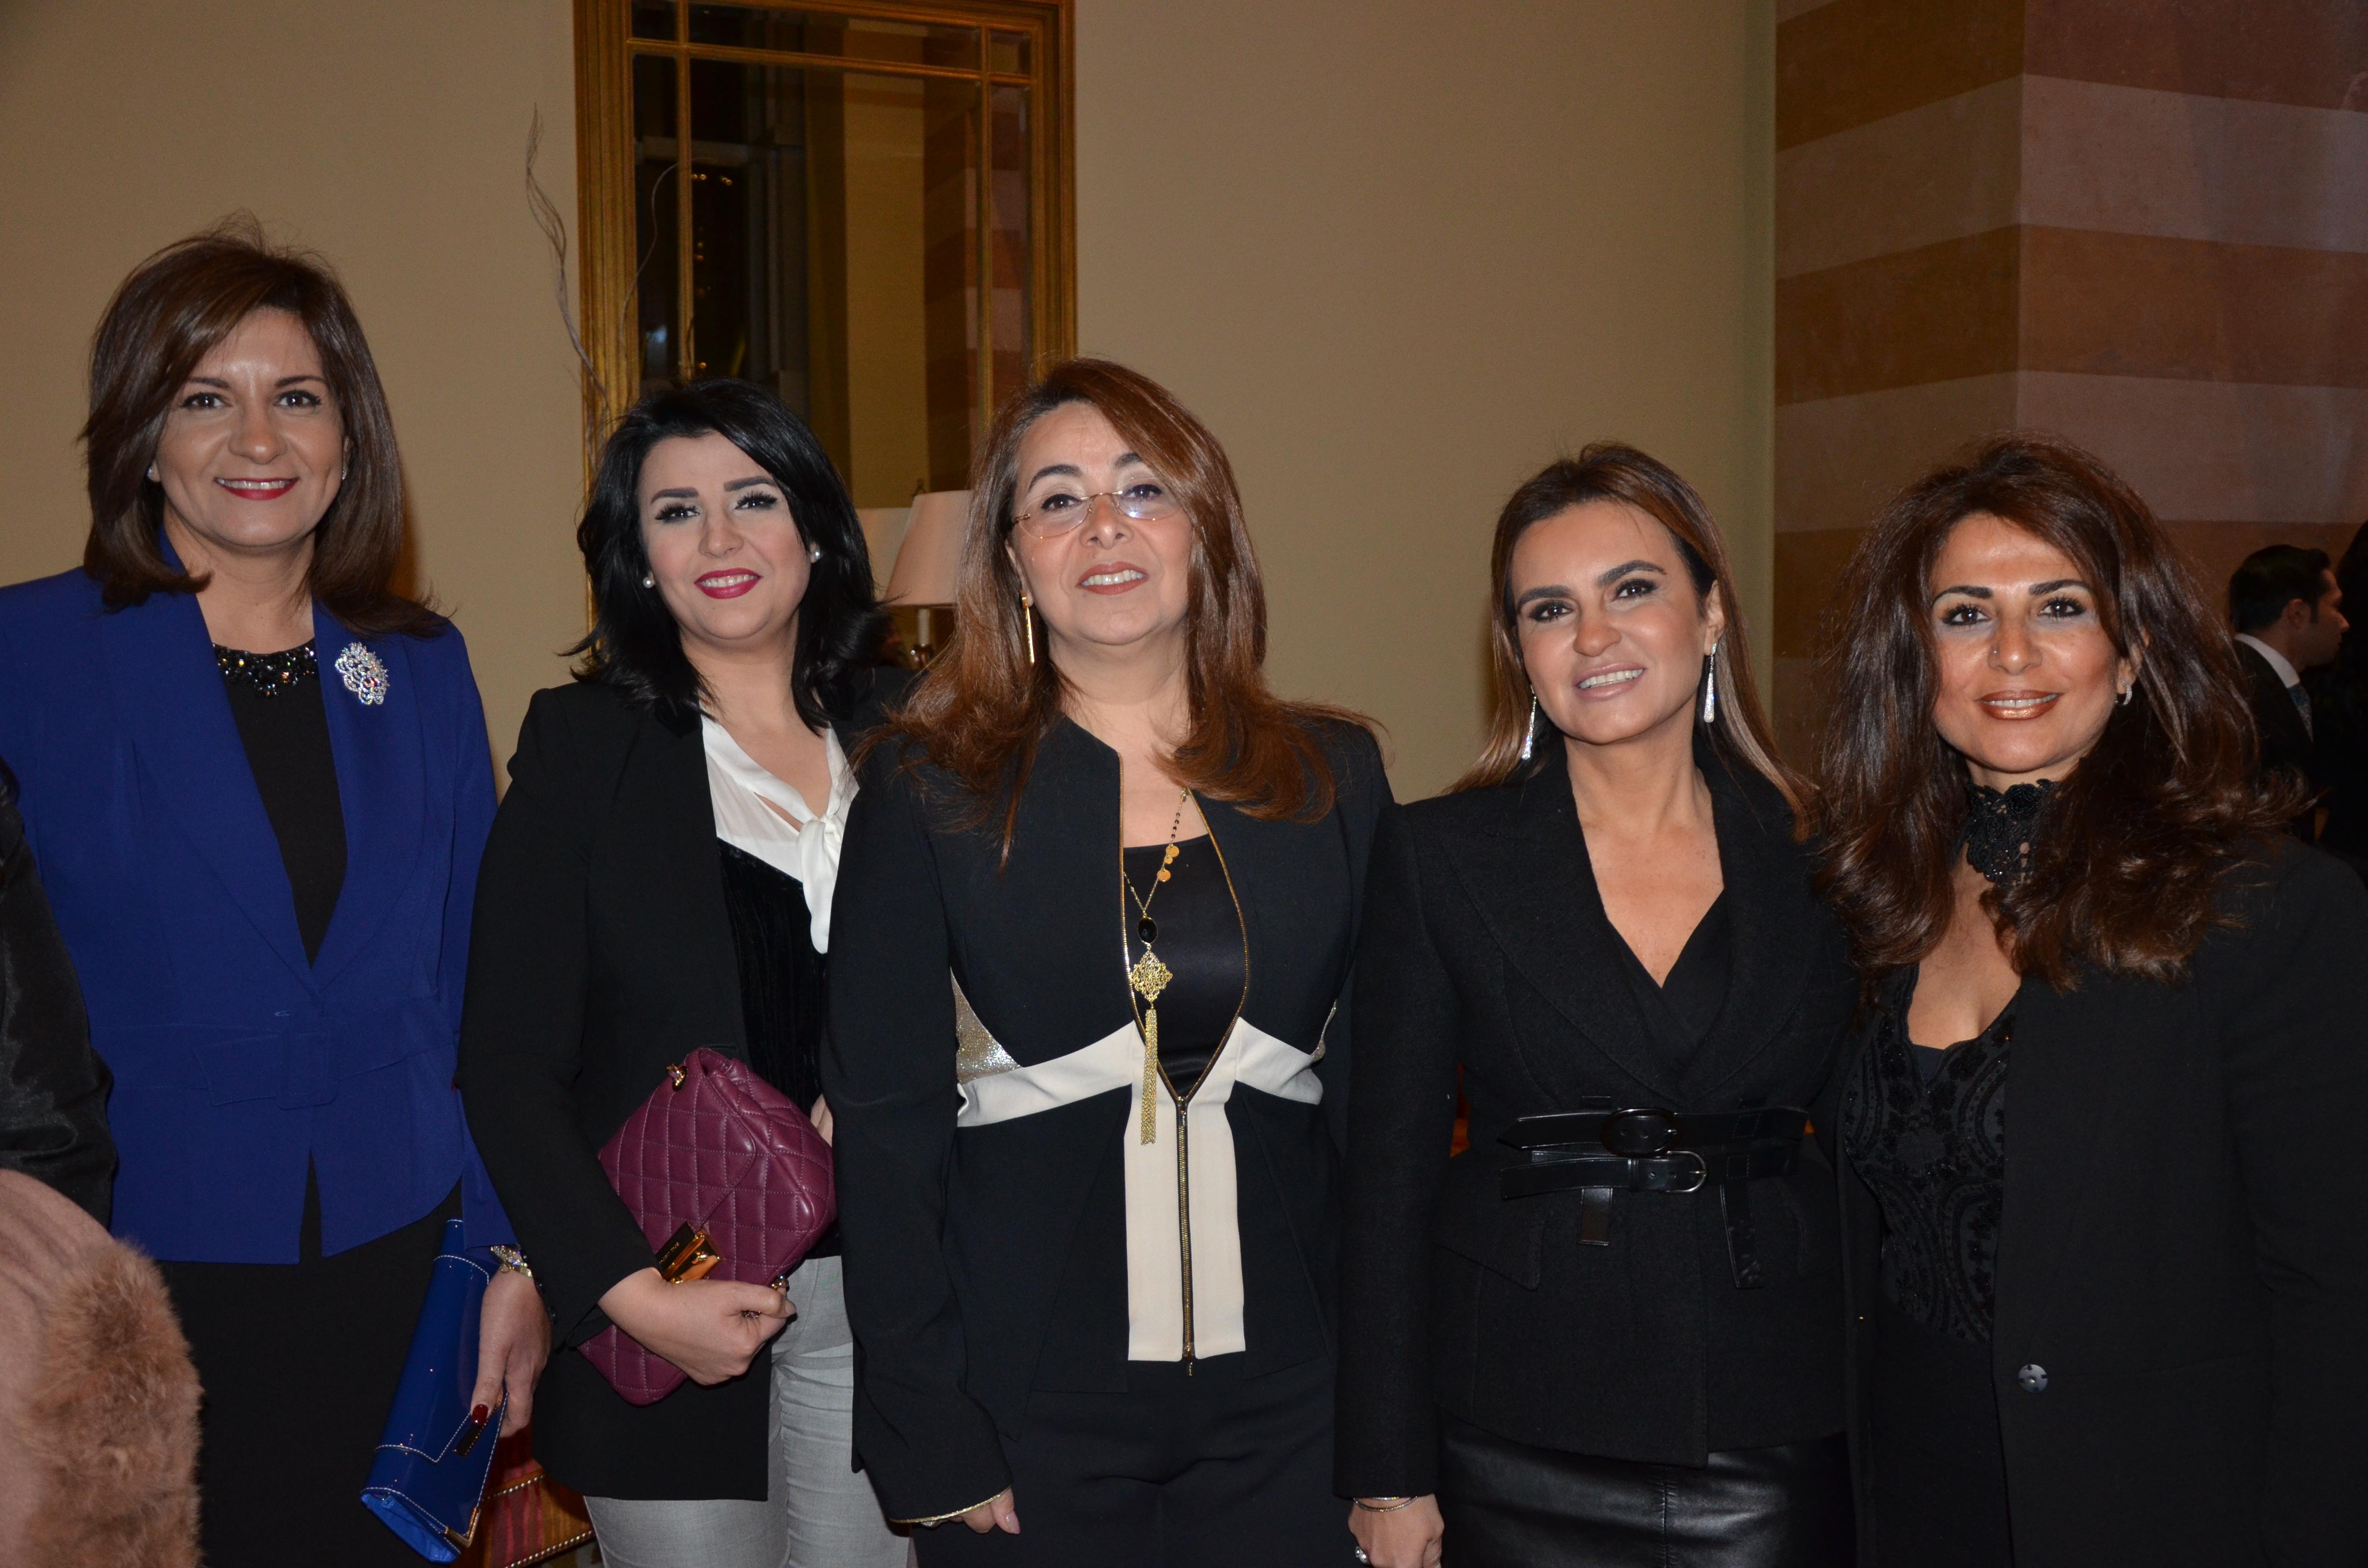 H.E. Ambassador Nabila Makram Abdel Shahid, H.E. Ghada Wally, H.E. Dr. Sahar Nasr & Nermine Ehssan